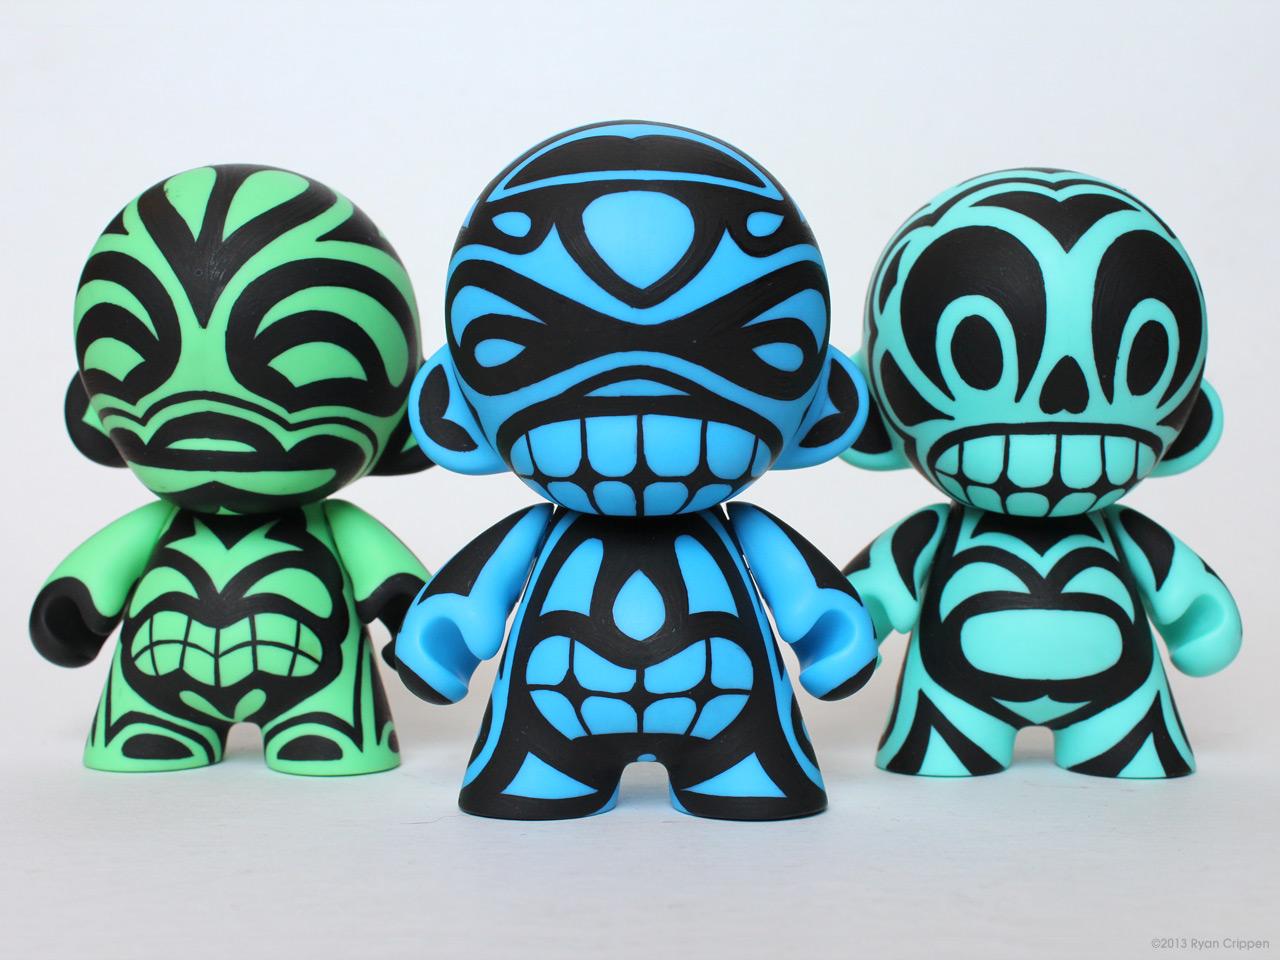 Sketch Totem Mini Munnys - Group 2